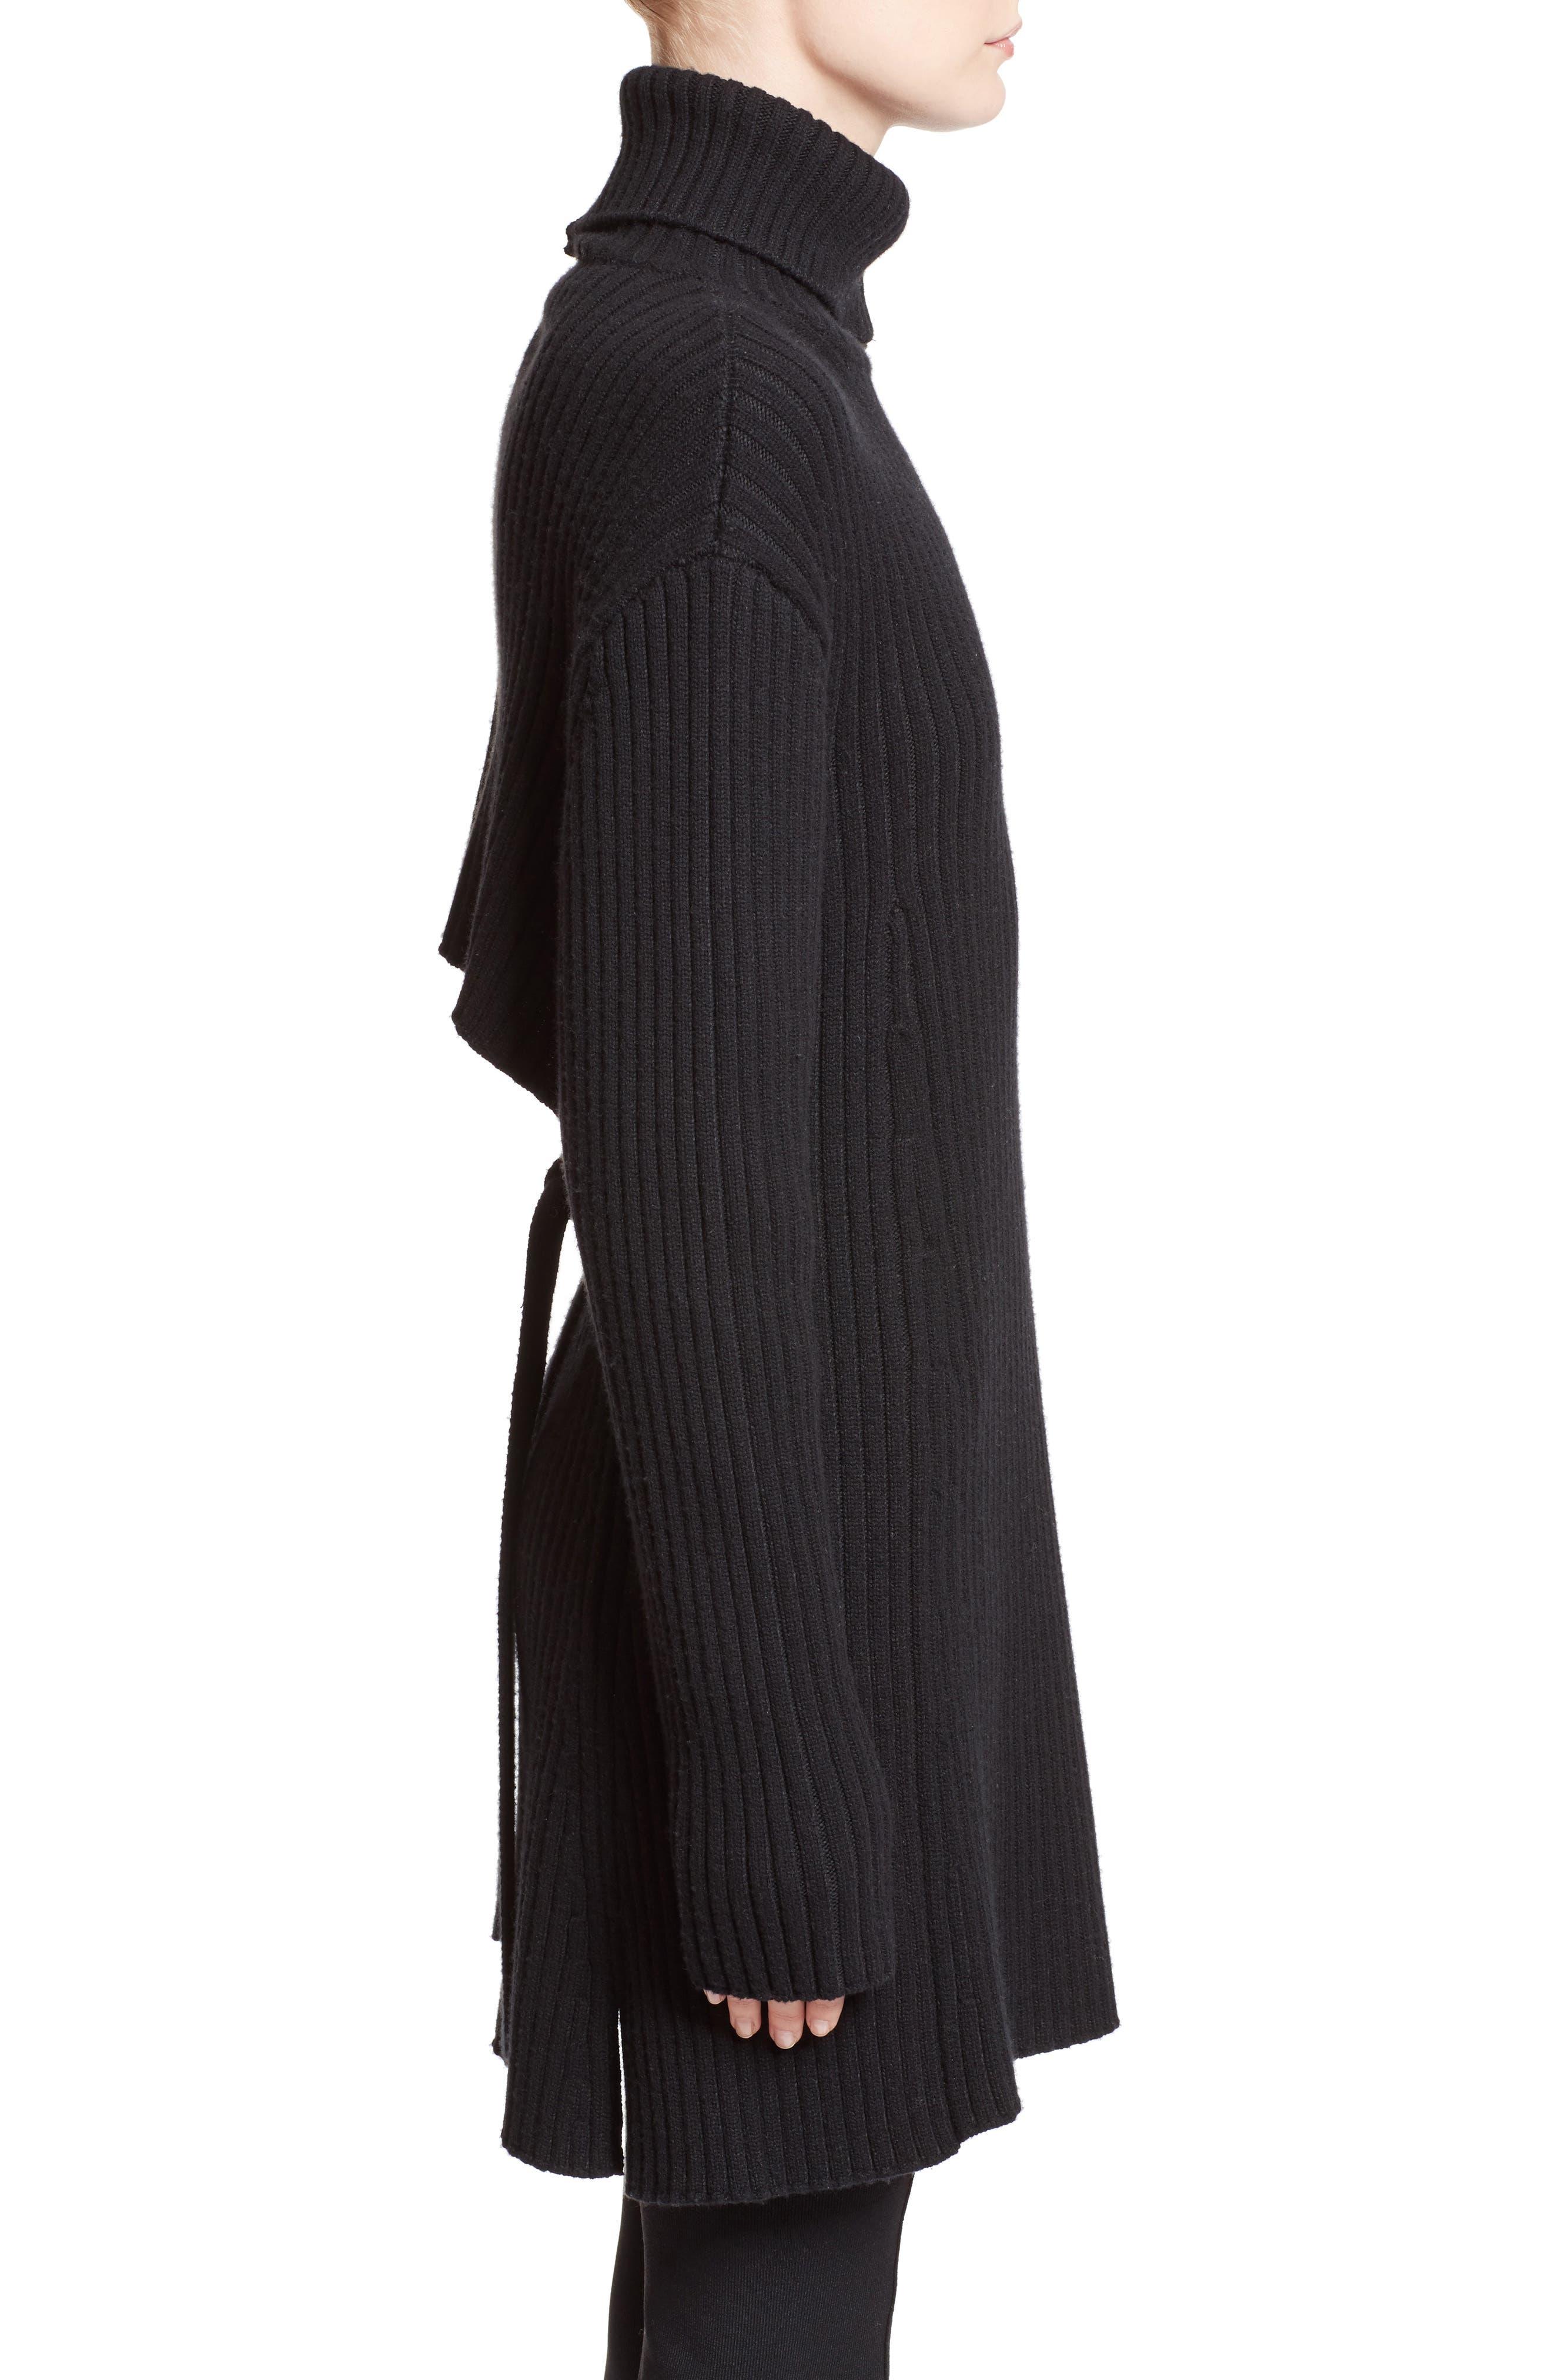 Alternate Image 4  - Proenza Schouler Wool & Cashmere Blend Turtleneck Dress